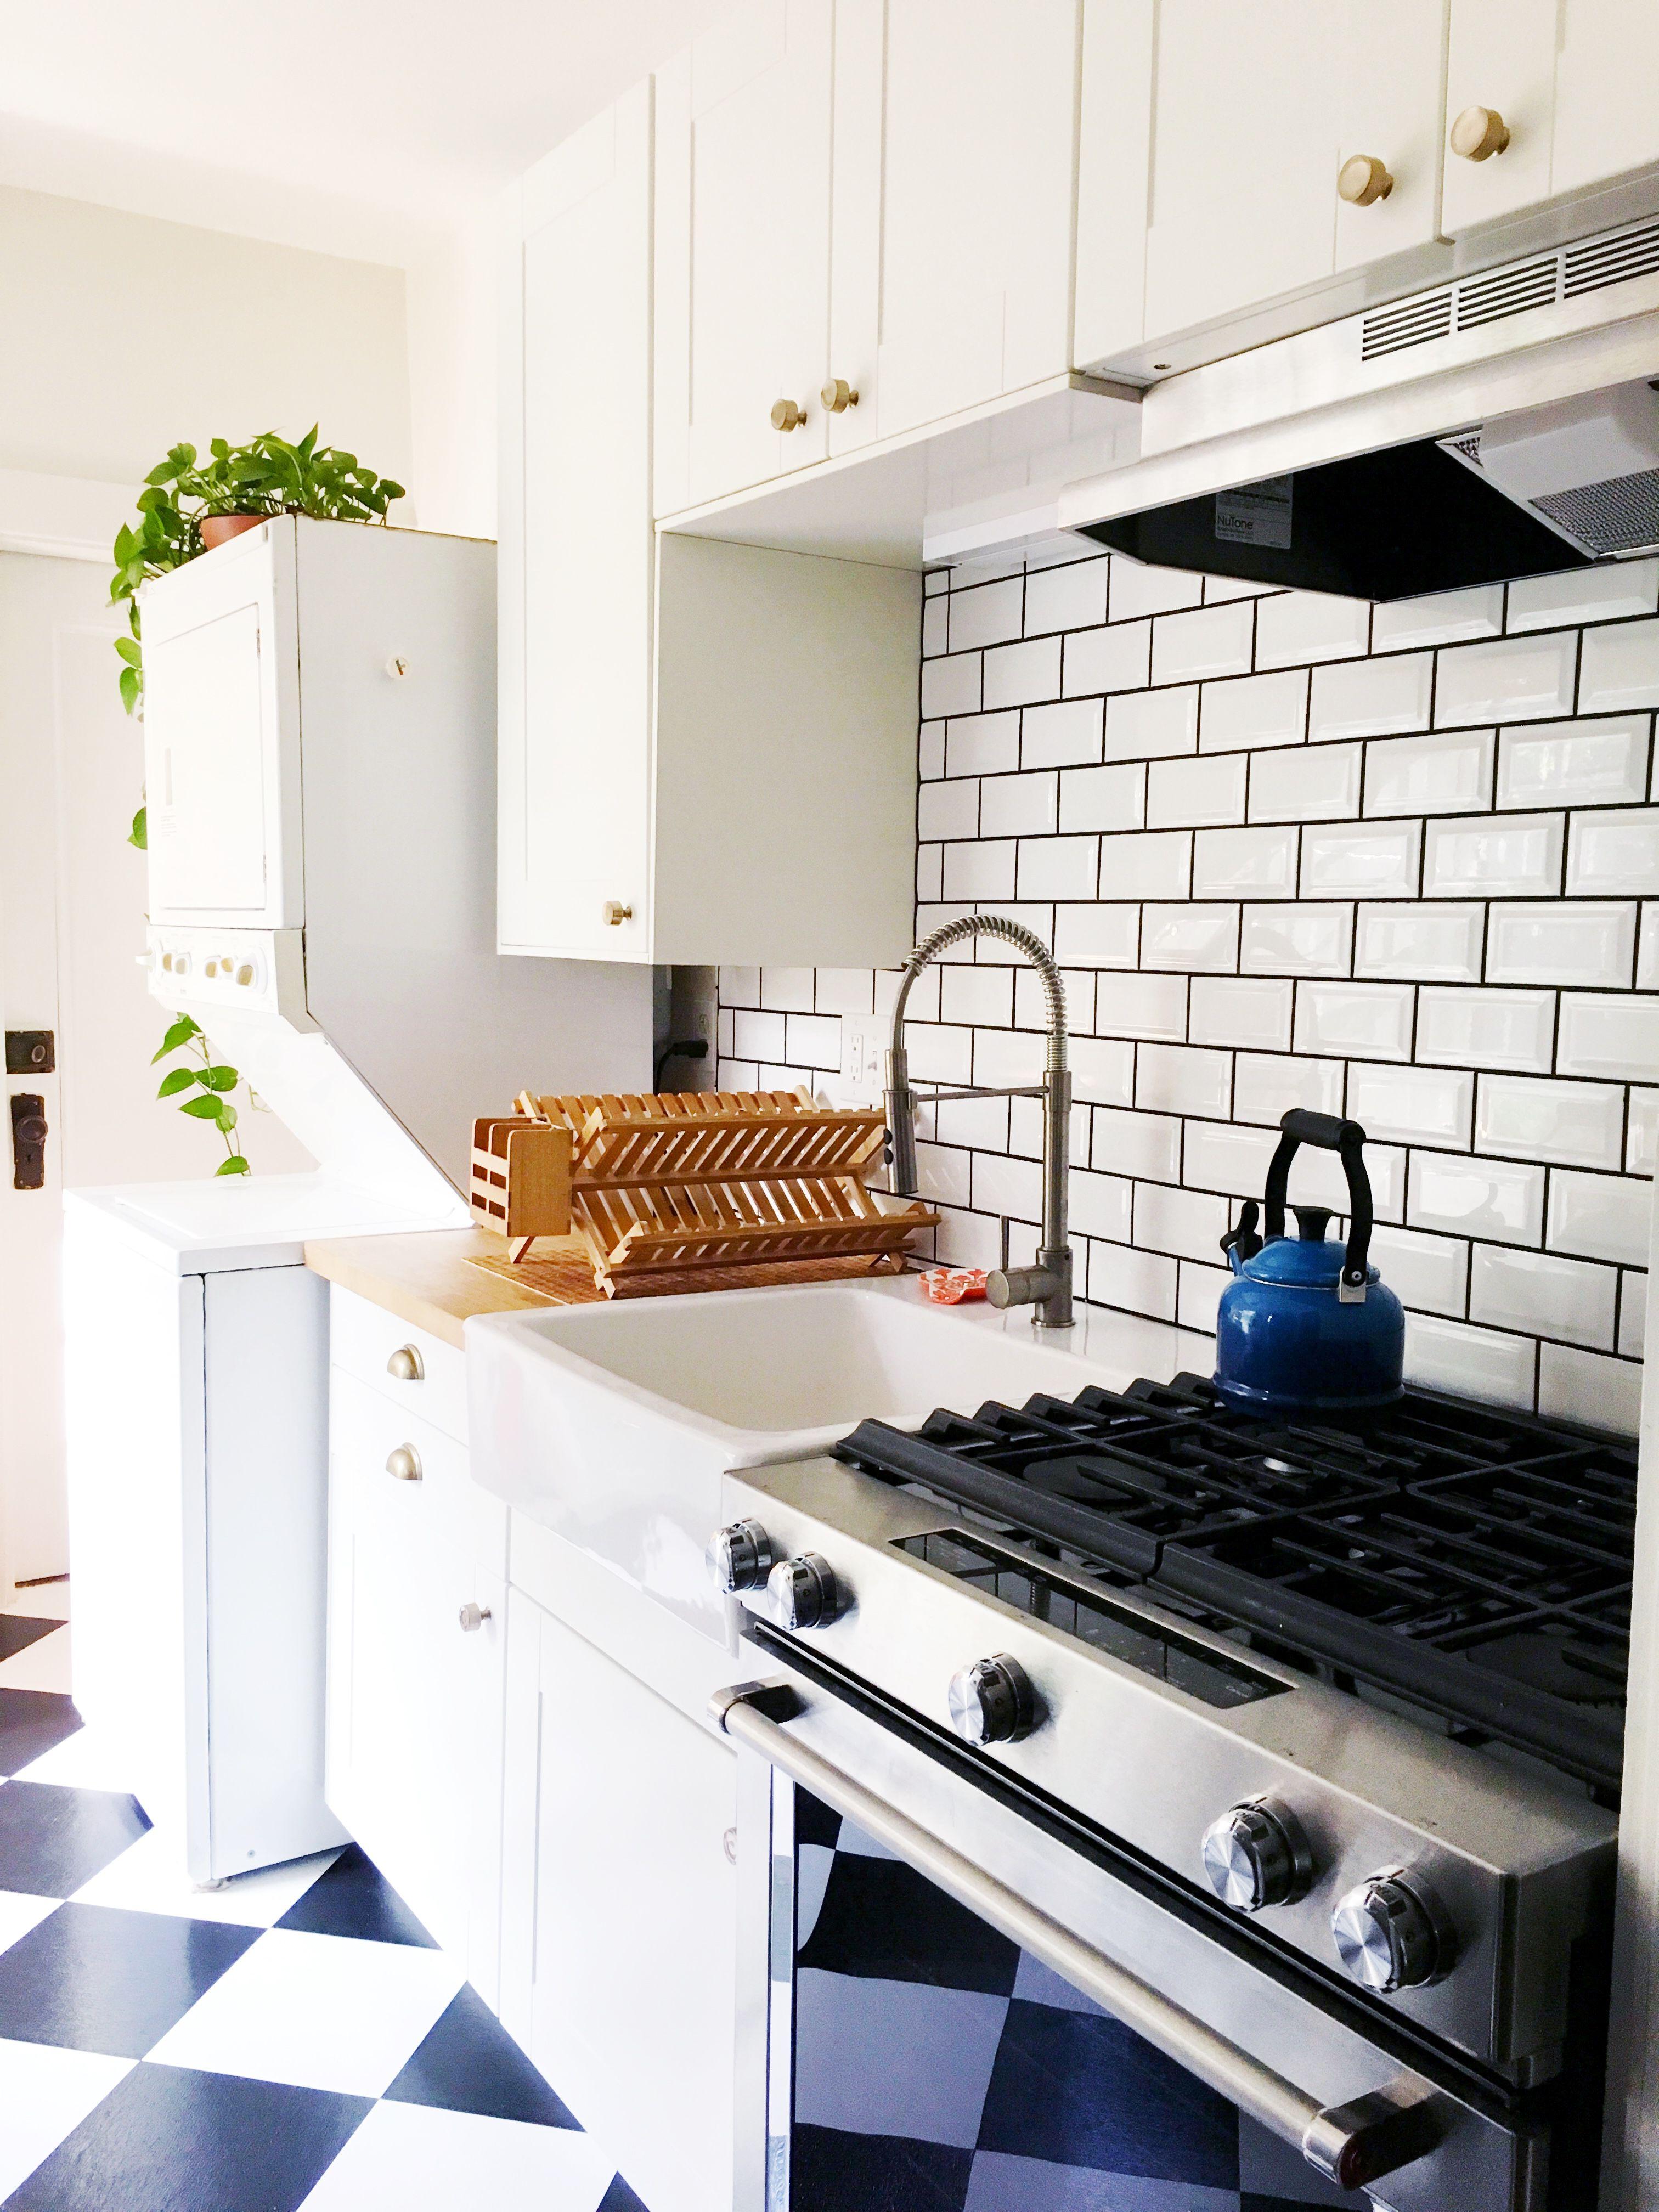 A Diy Designer Chronic Rearranger S Boston Condo Kitchen Cabinets Makeover Coastal Kitchen White Kitchen Cabinets